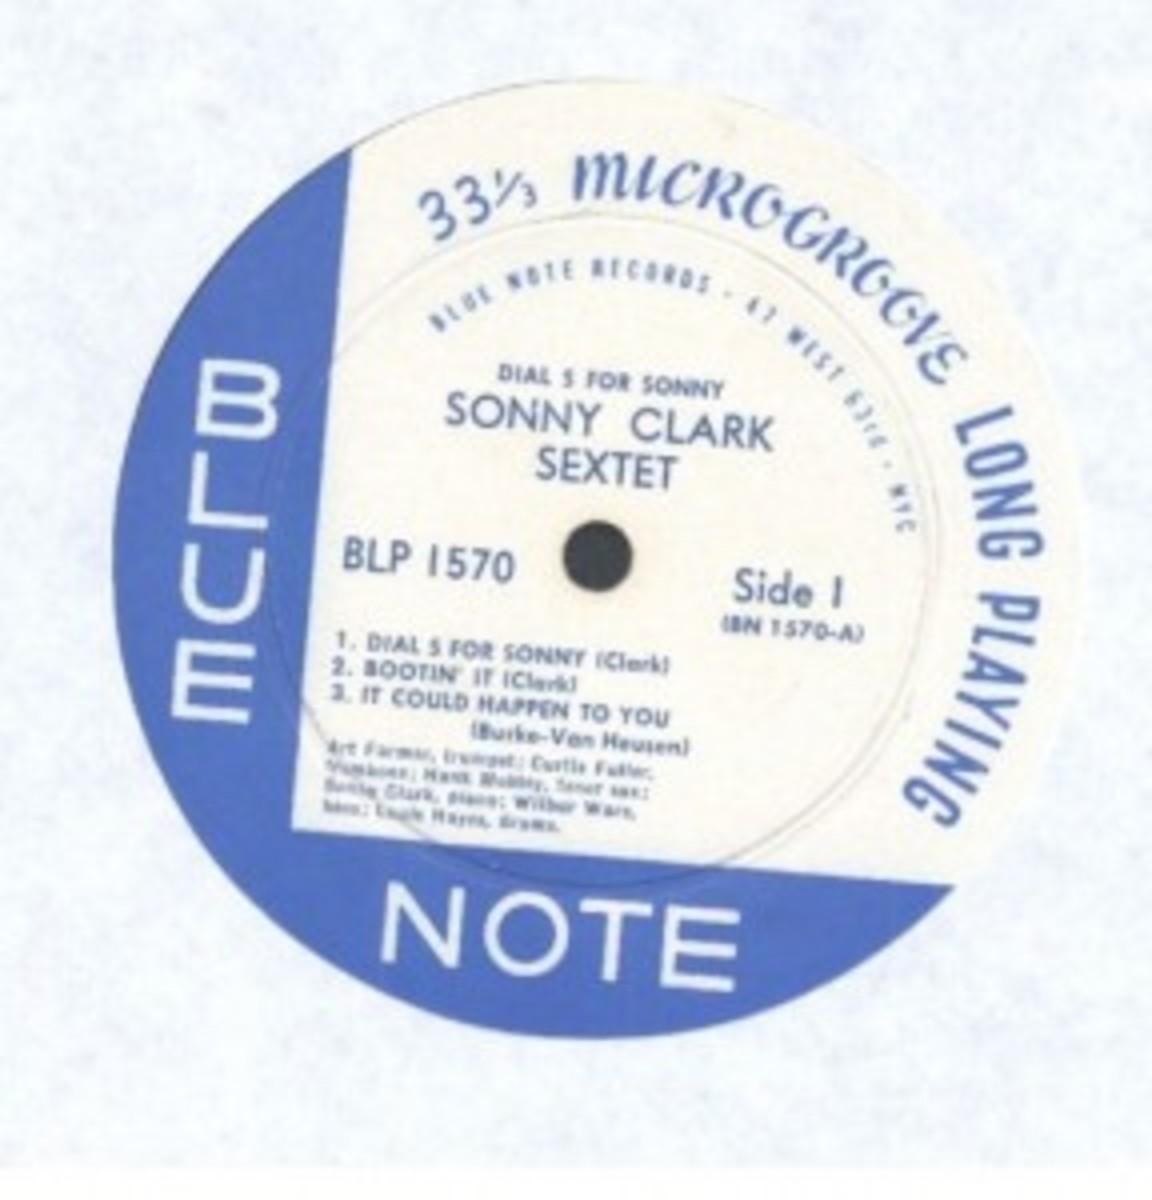 Sonny Clark Sextet Blue Note